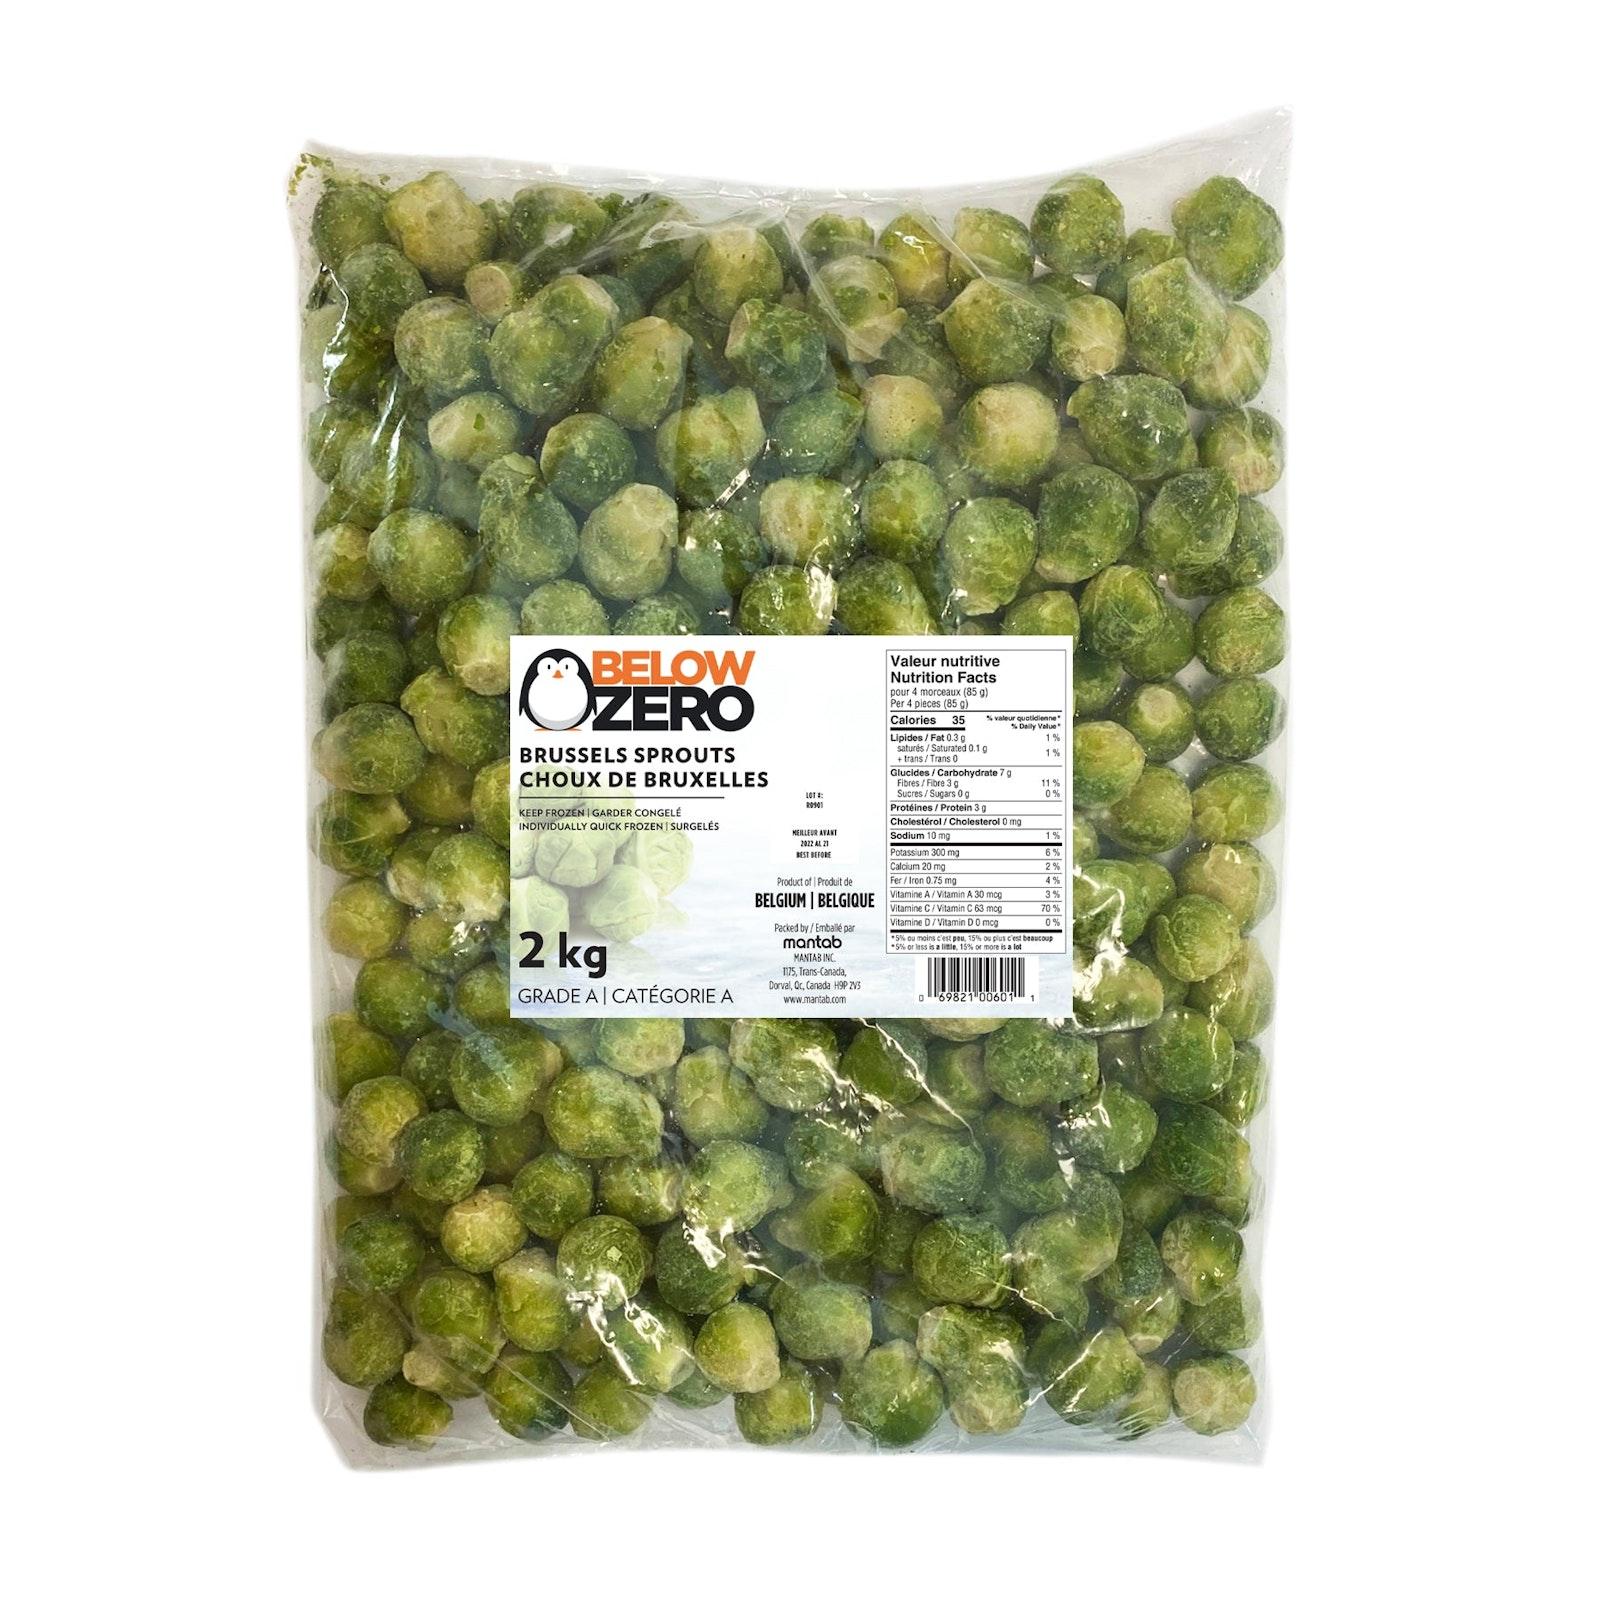 BELOW ZERO Brussels sprouts